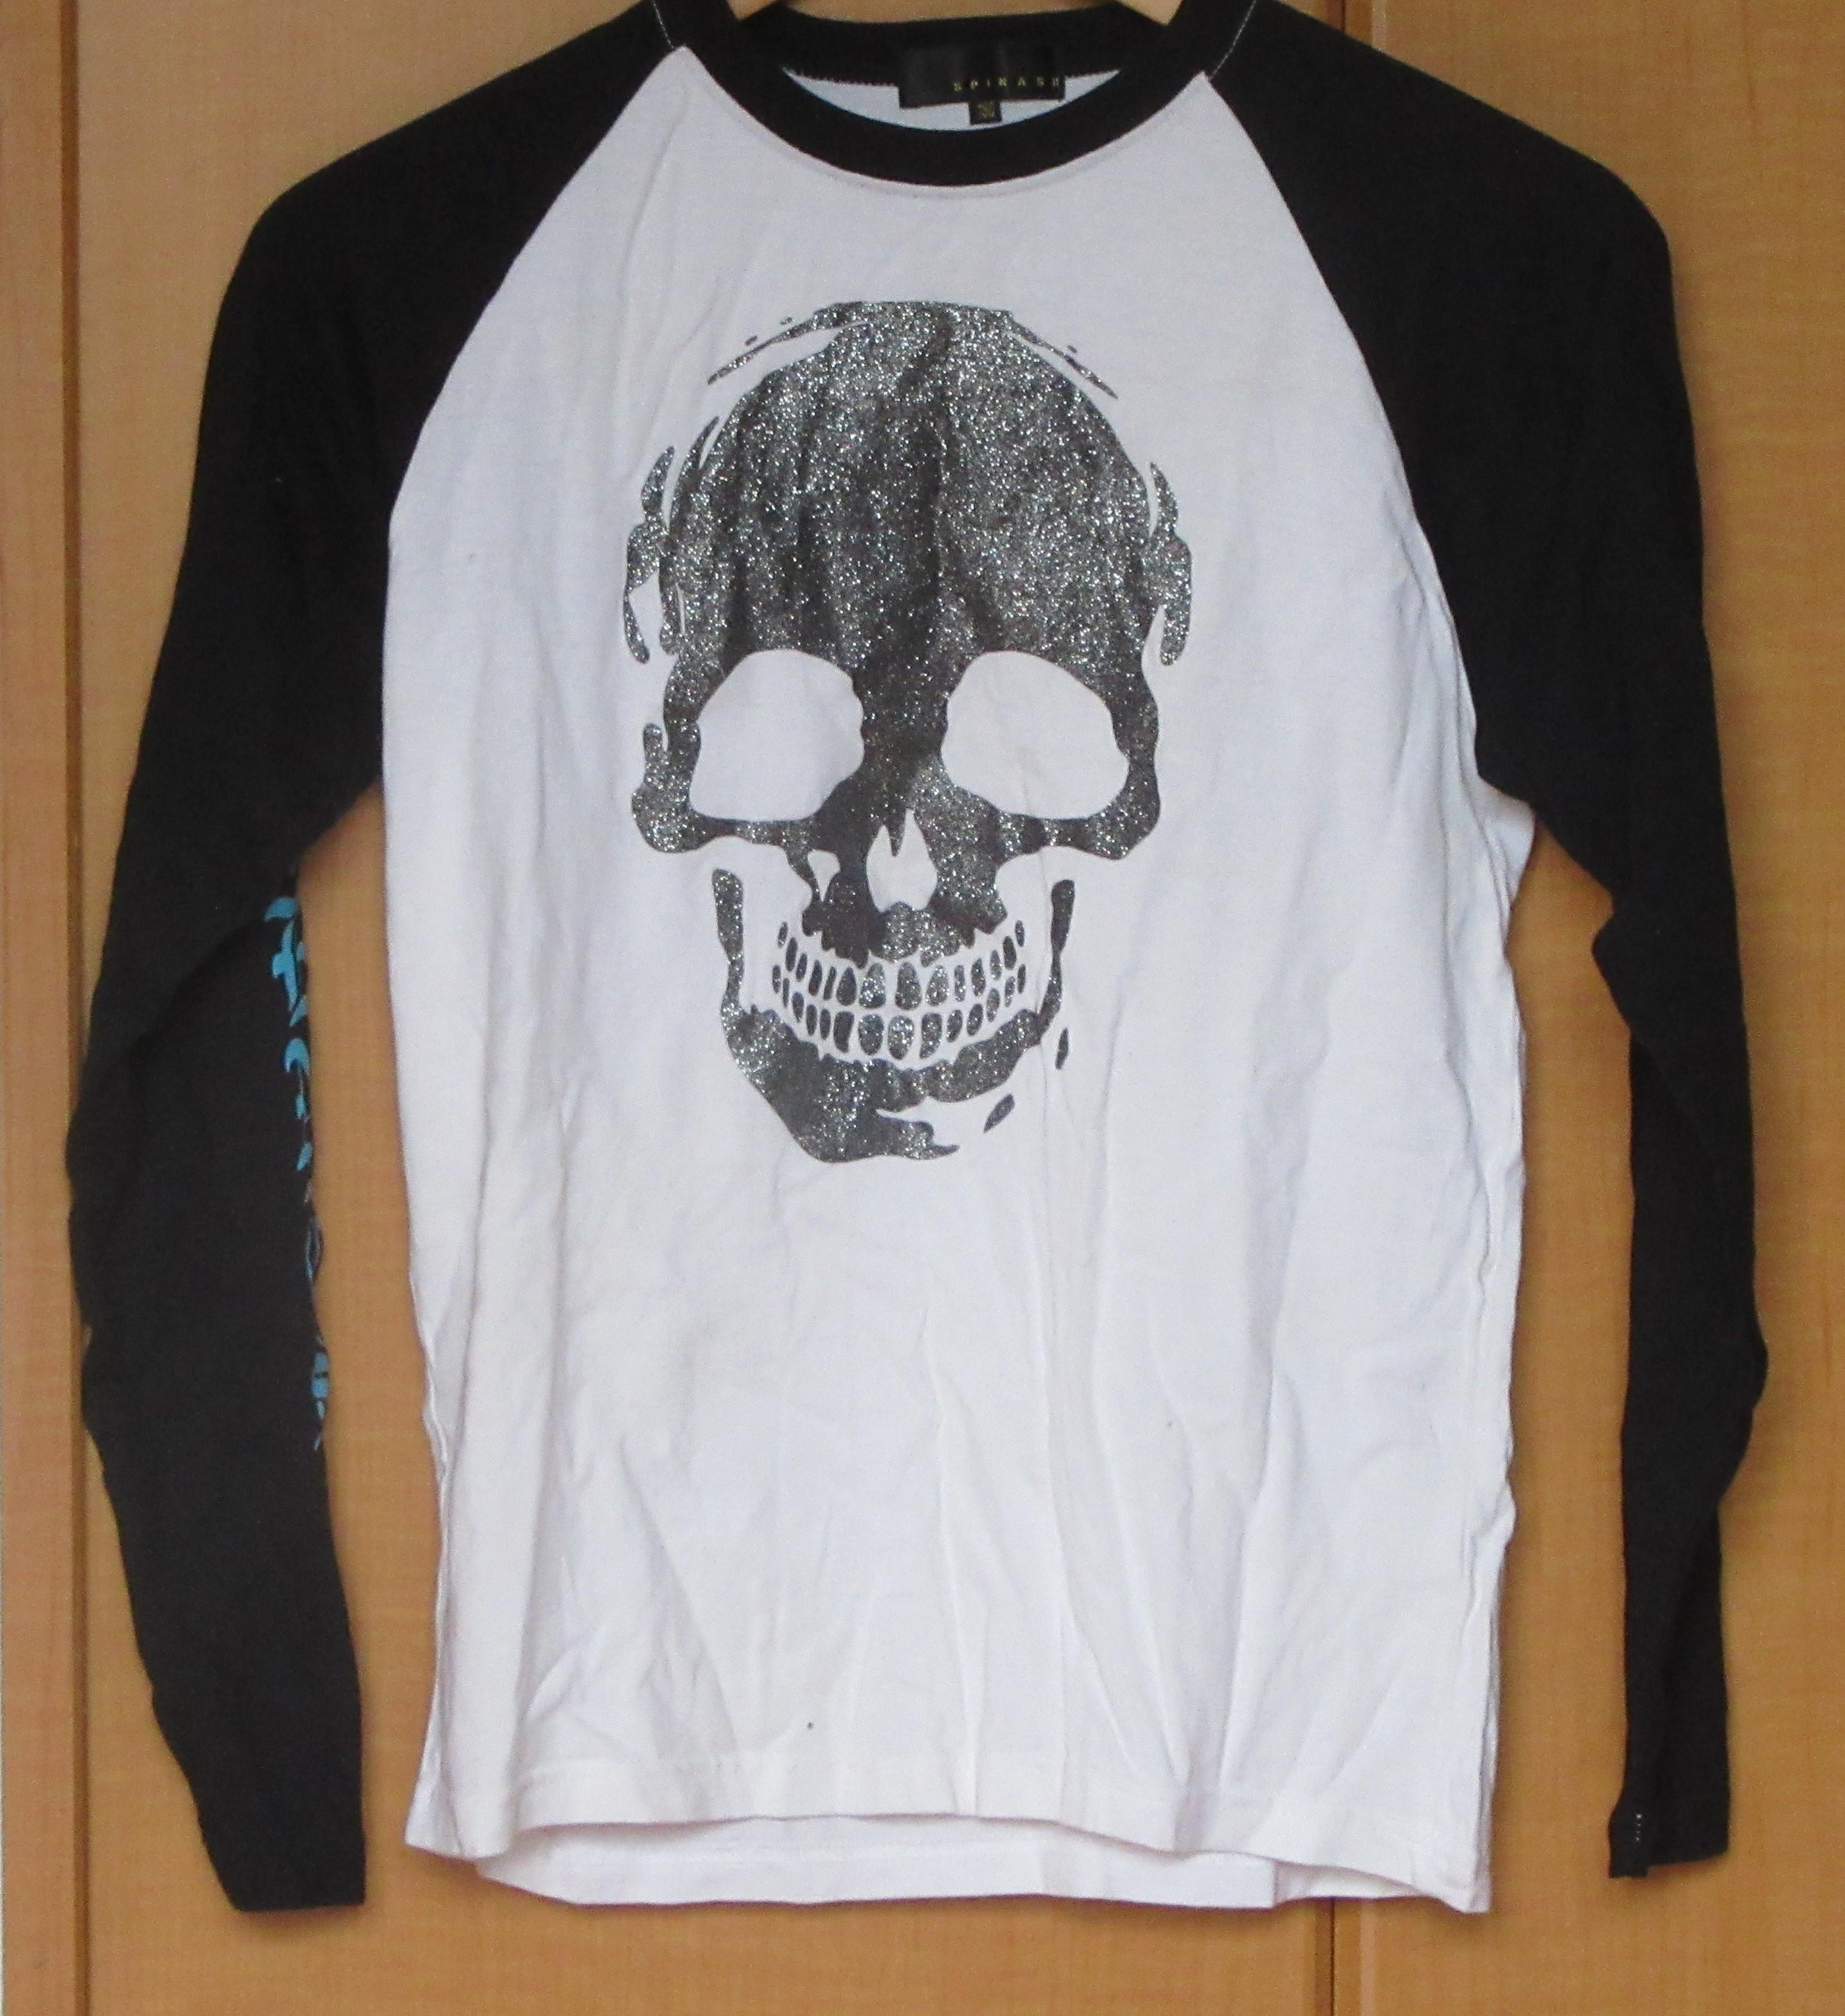 Tシャツ 長袖 Sサイズ ドクロマーク リセール商品